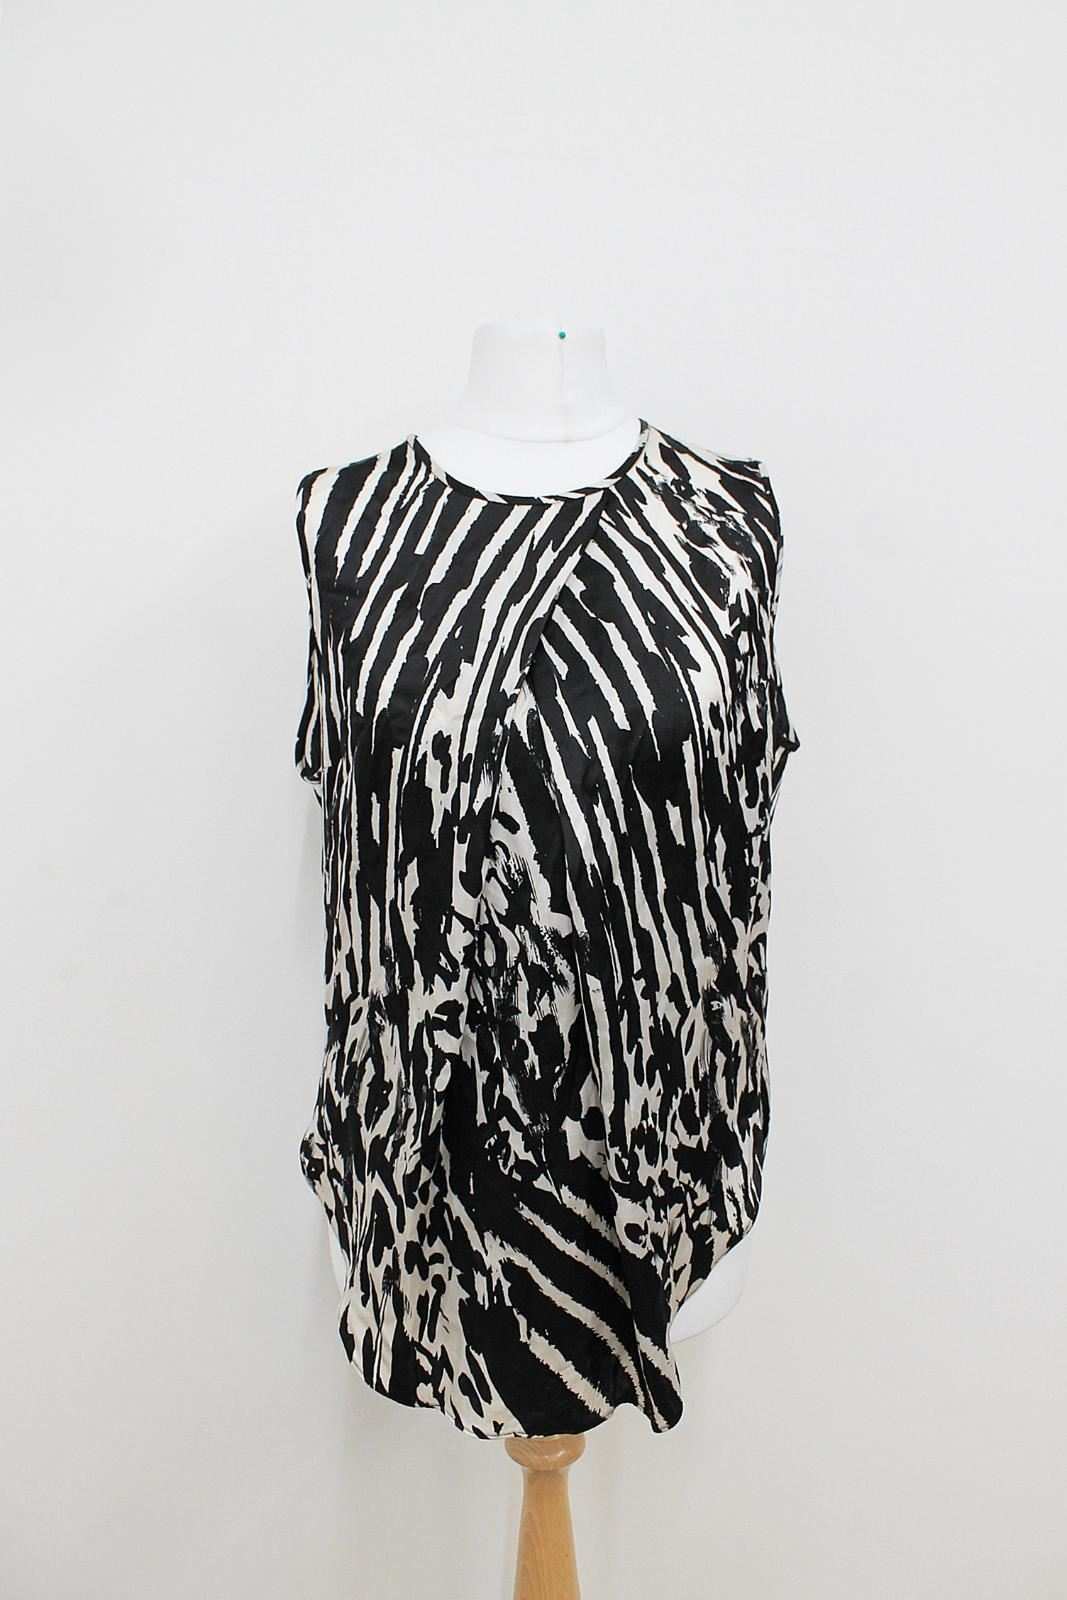 MB BY MALENE BIRGER Ladies schwarz Weiß Zebra Pattern Crew Neck Top EU36 UK8